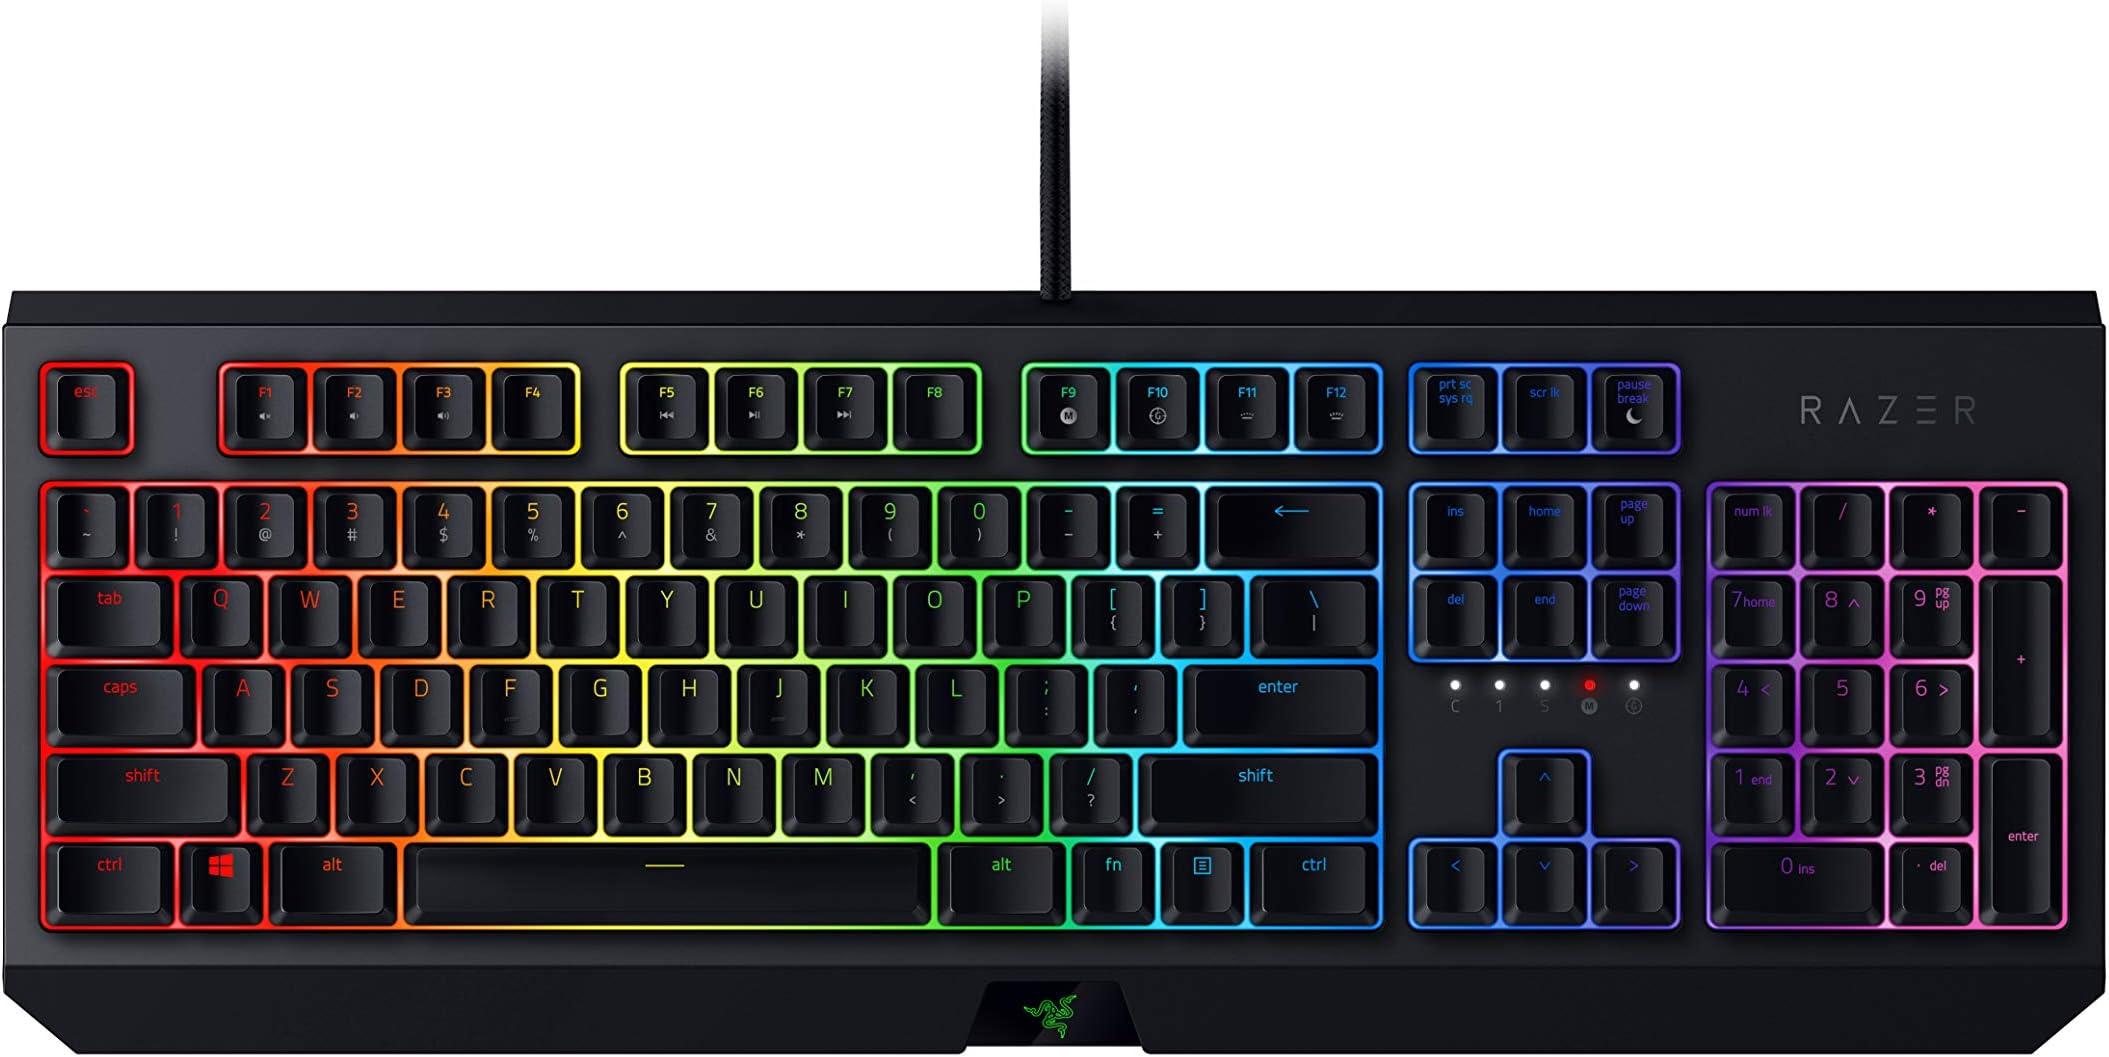 Razer BlackWidow Mechanical Gaming Keyboard: Green Mechanical Switches - Tactile & Clicky - Chroma RGB Lighting - Anti-Ghosting - Programmable Macro Functionality